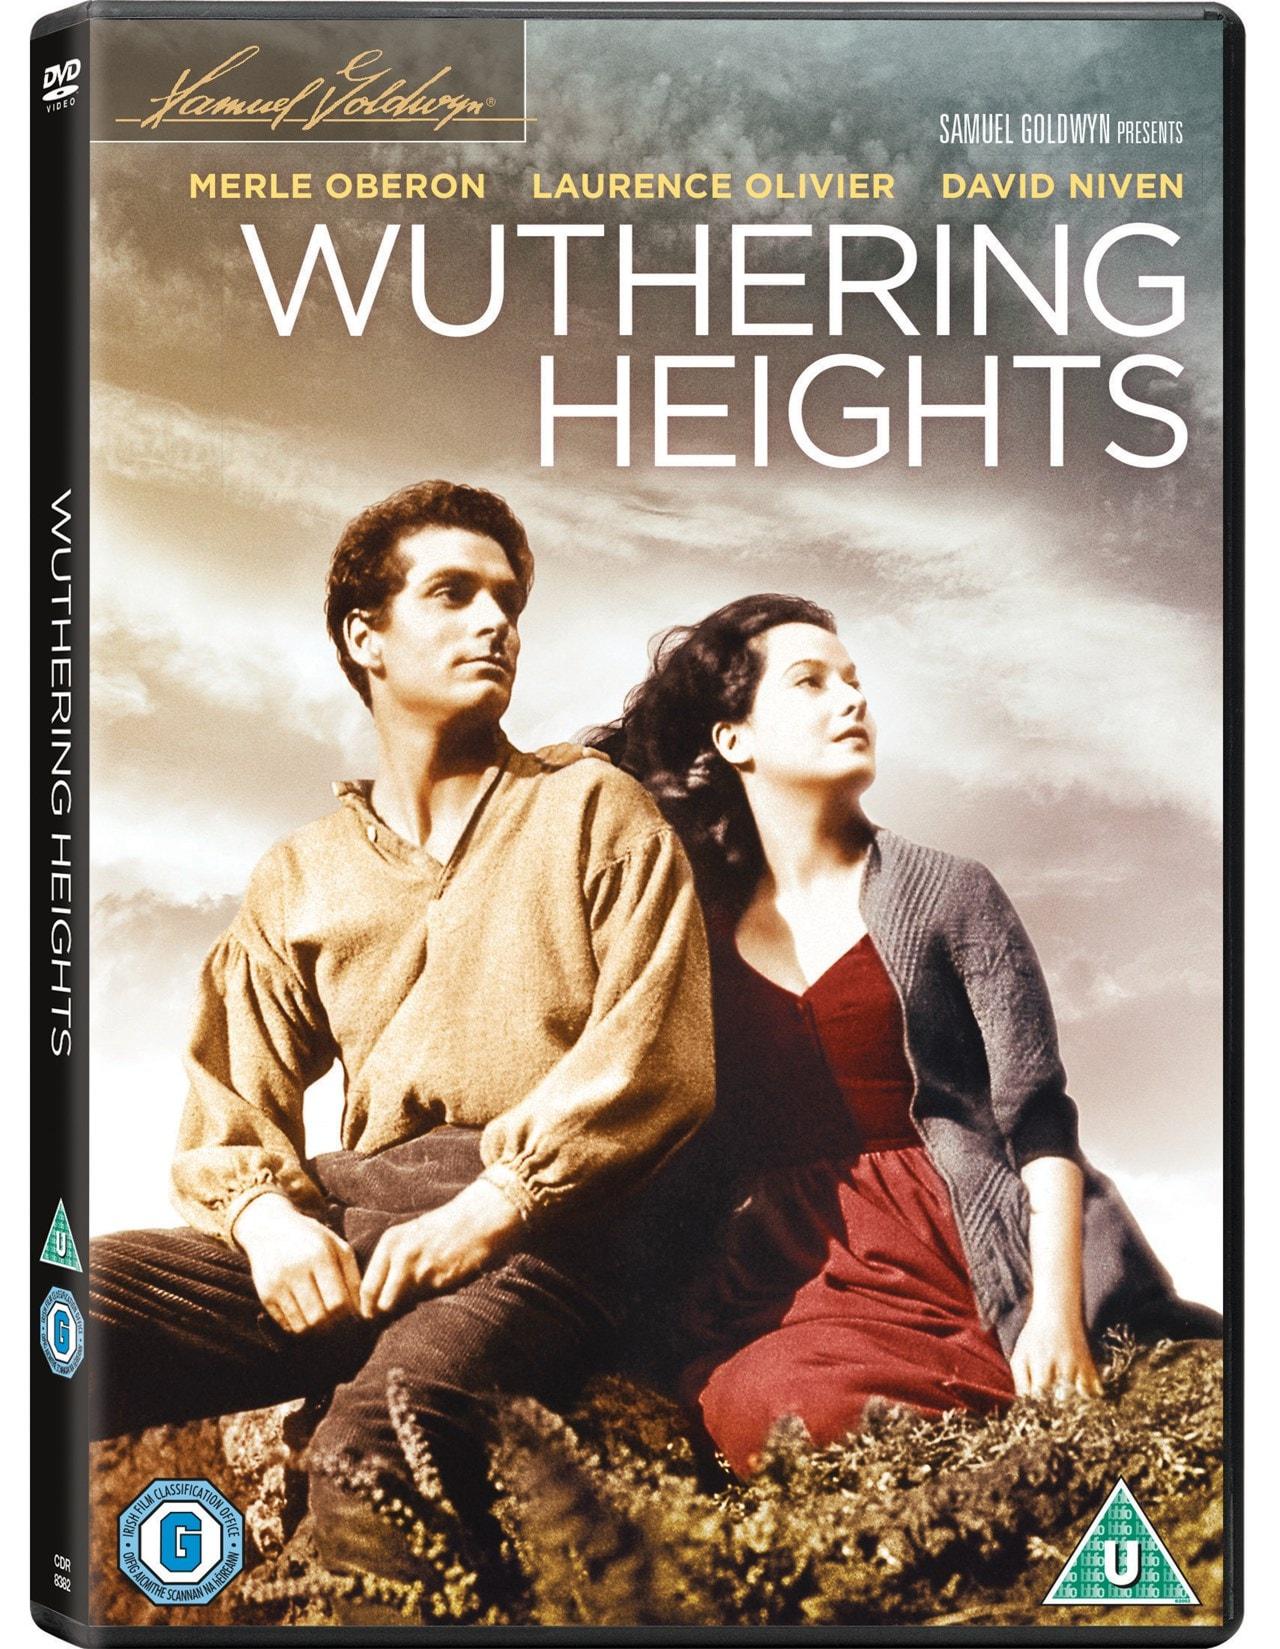 Wuthering Heights - Samuel Goldwyn Presents - 2